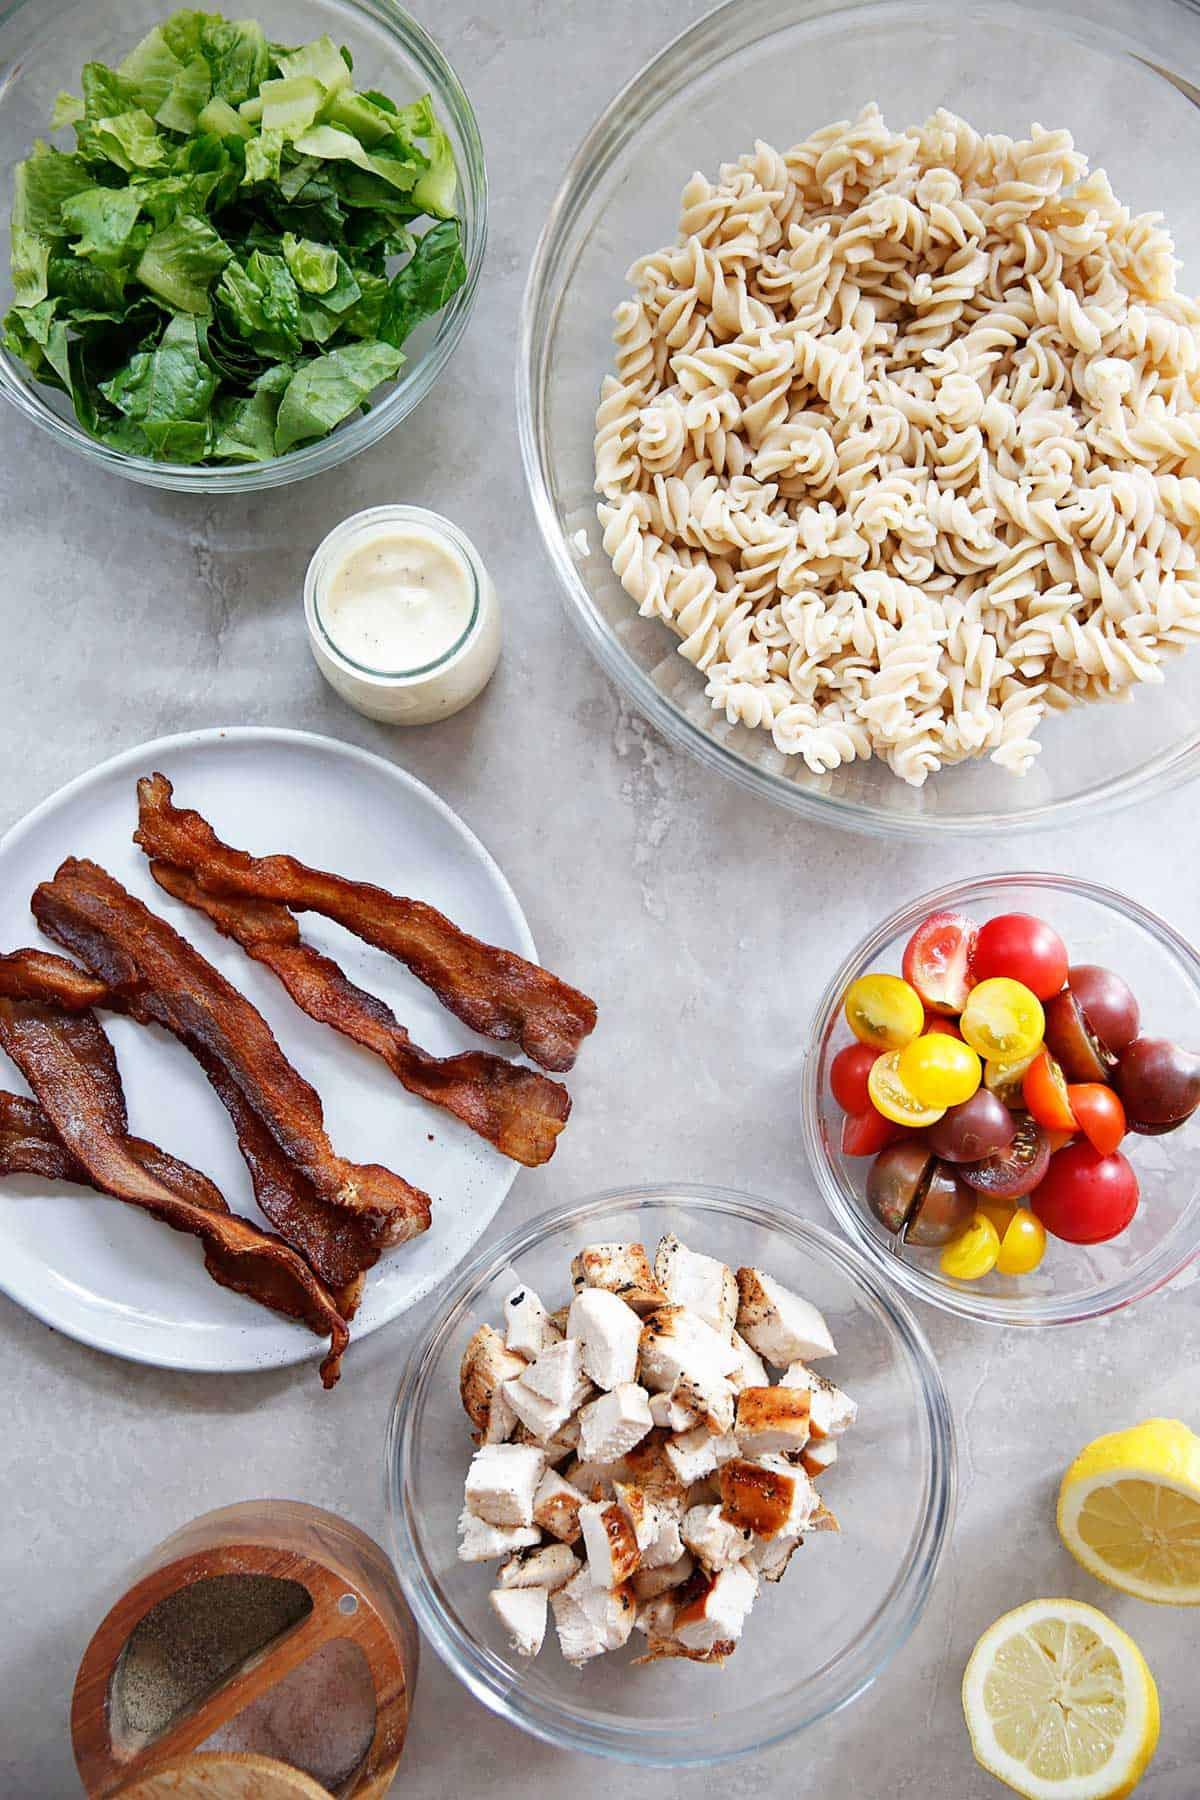 Ingredients for caesar pasta salad